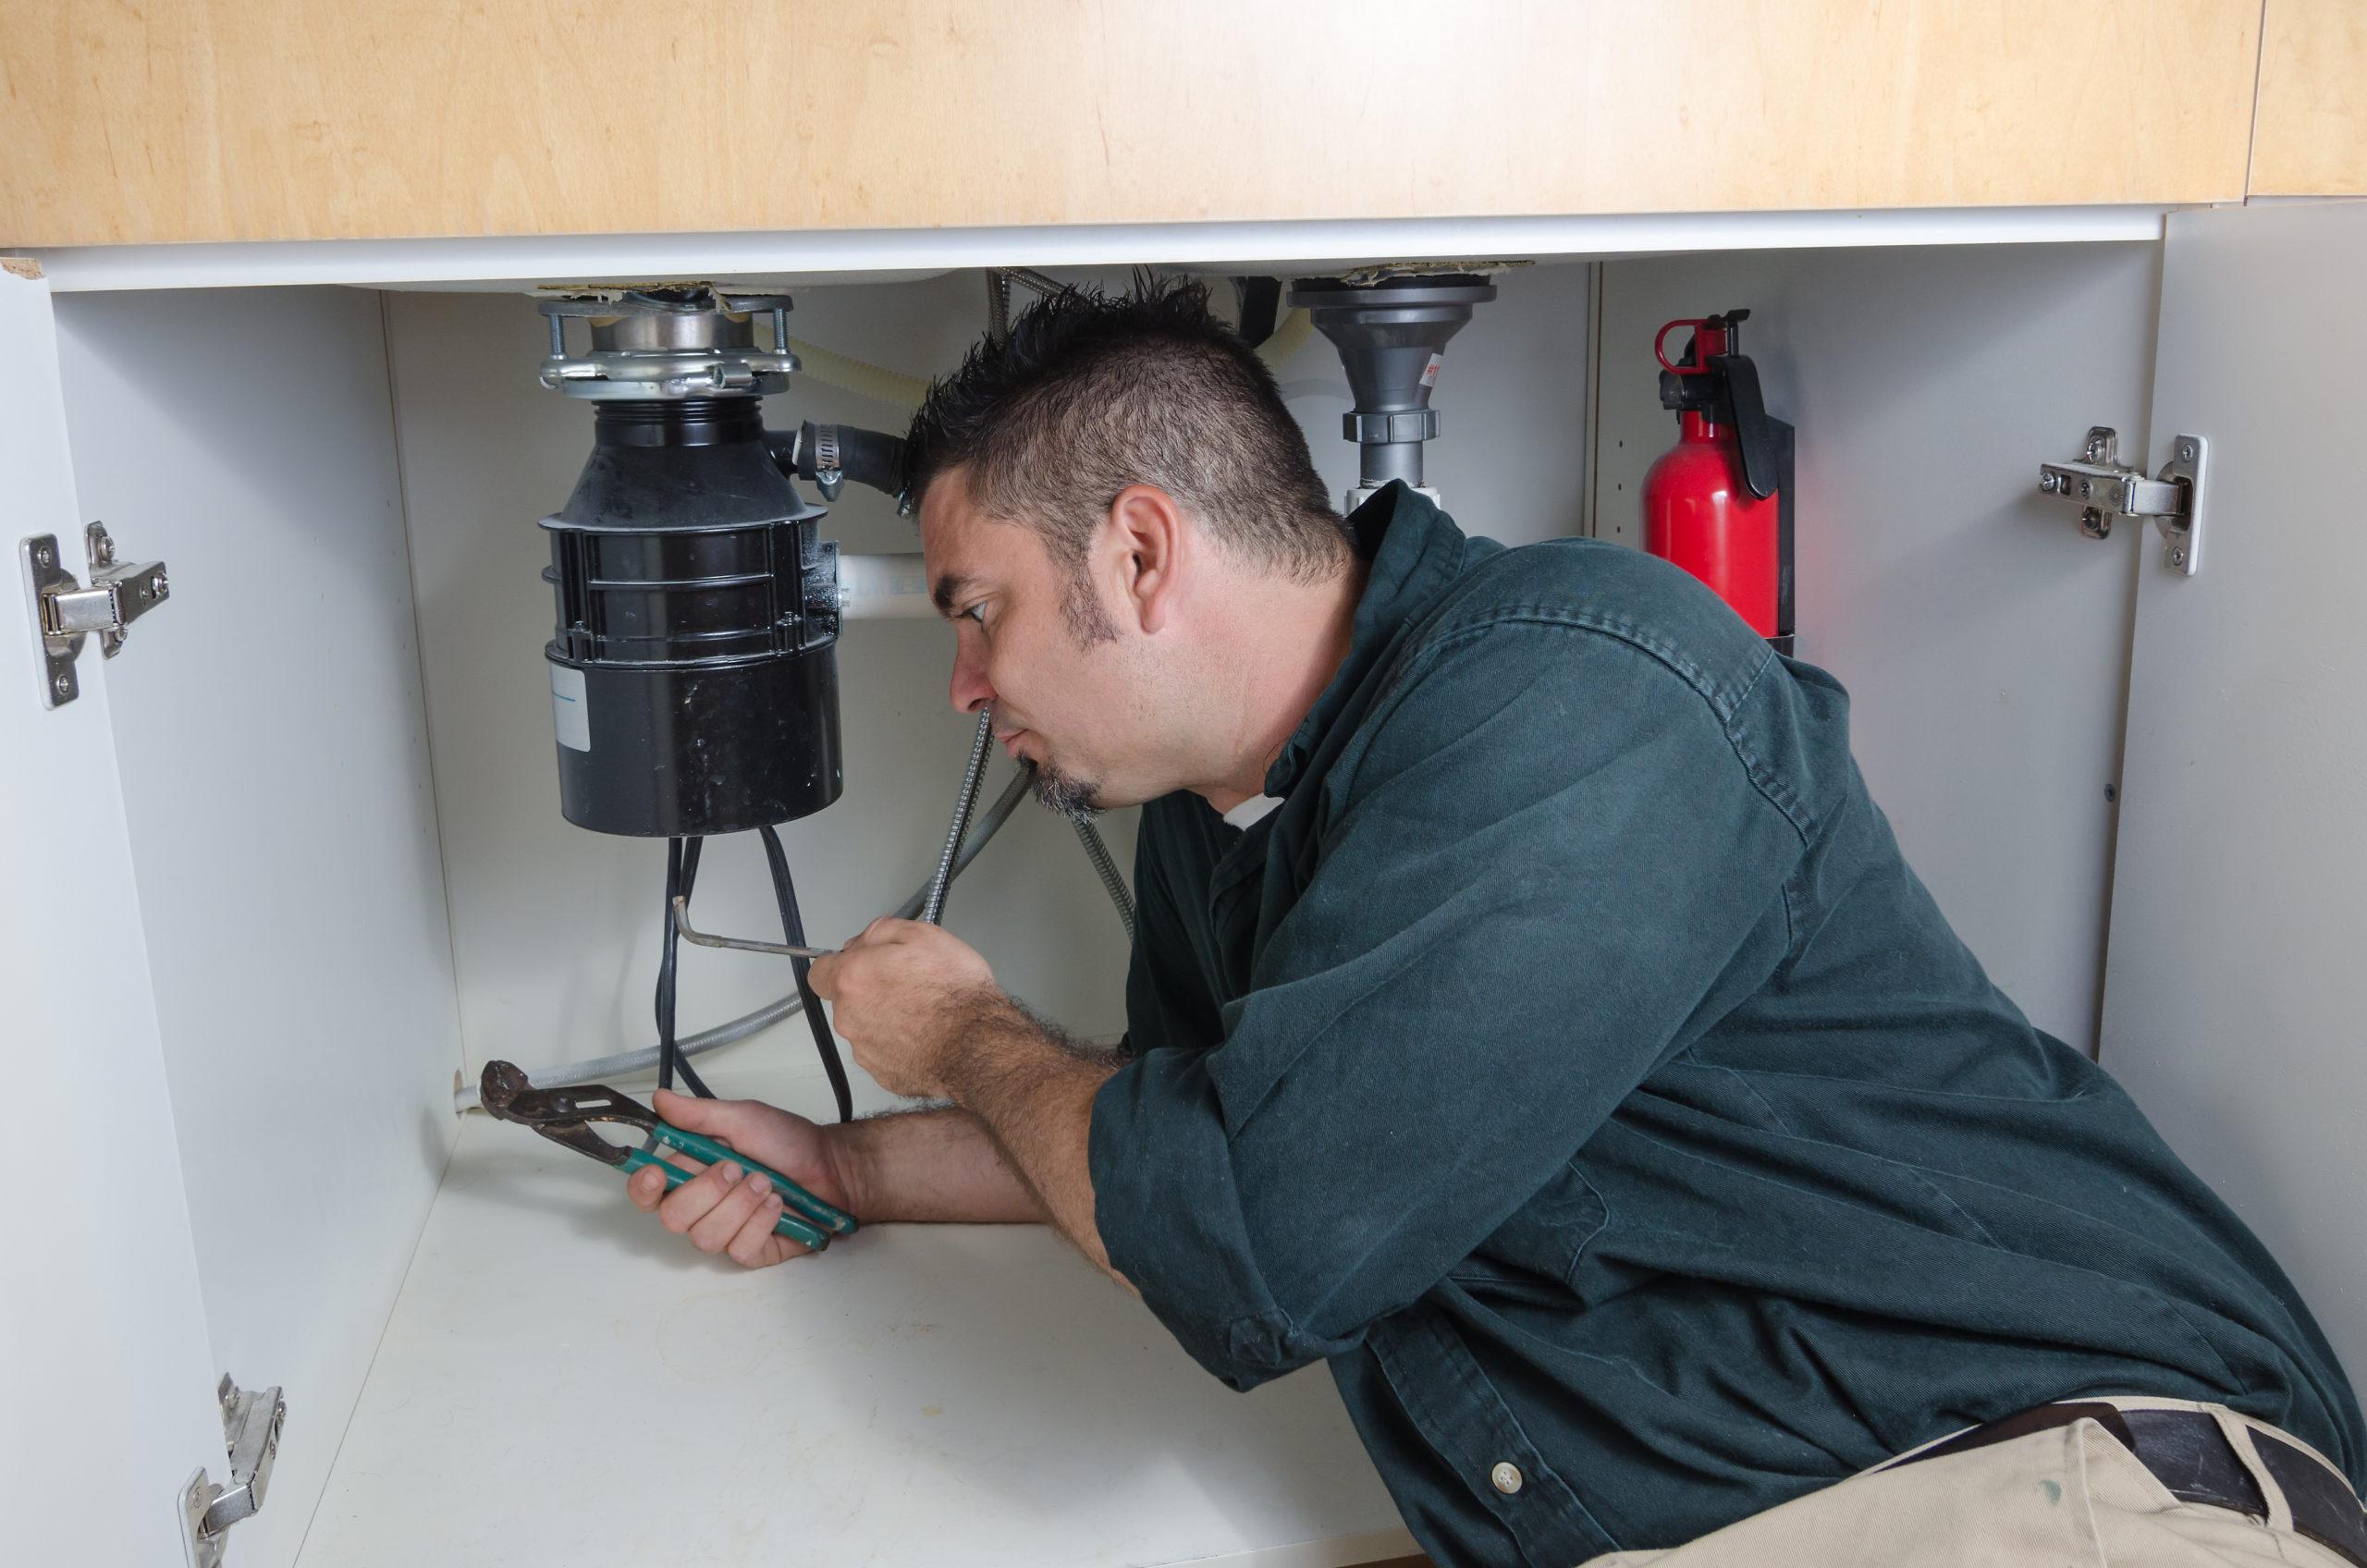 technician servicing sink garbage disposal